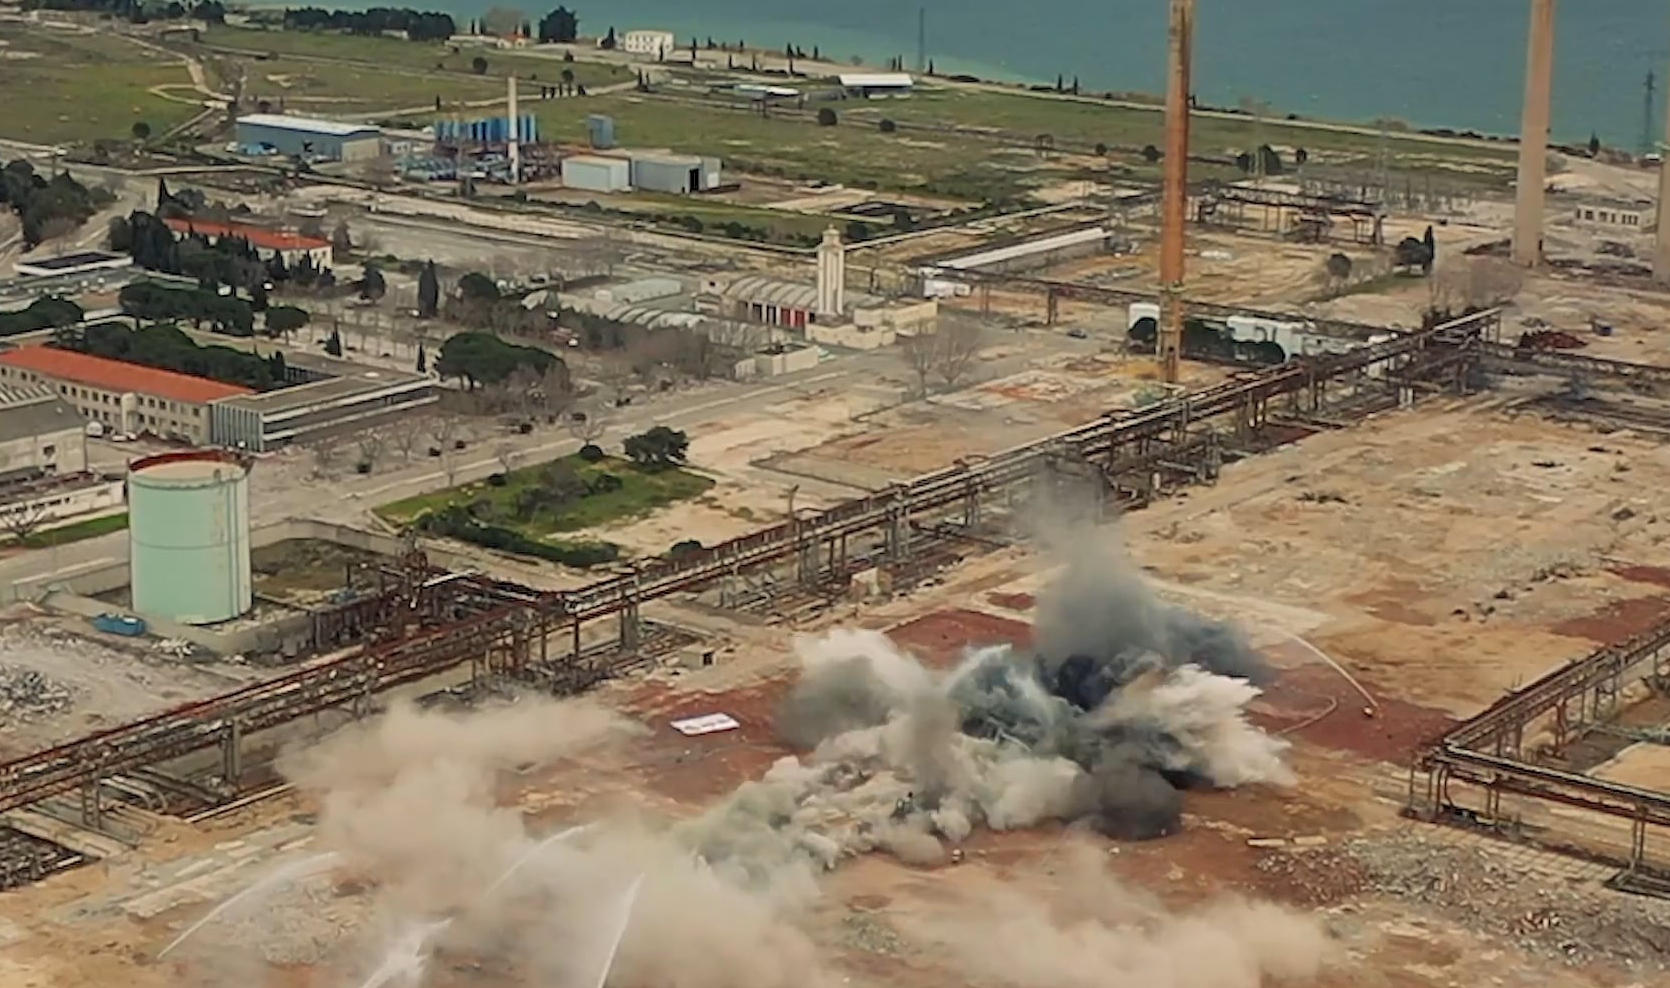 Marseille Oil Refinery 2020